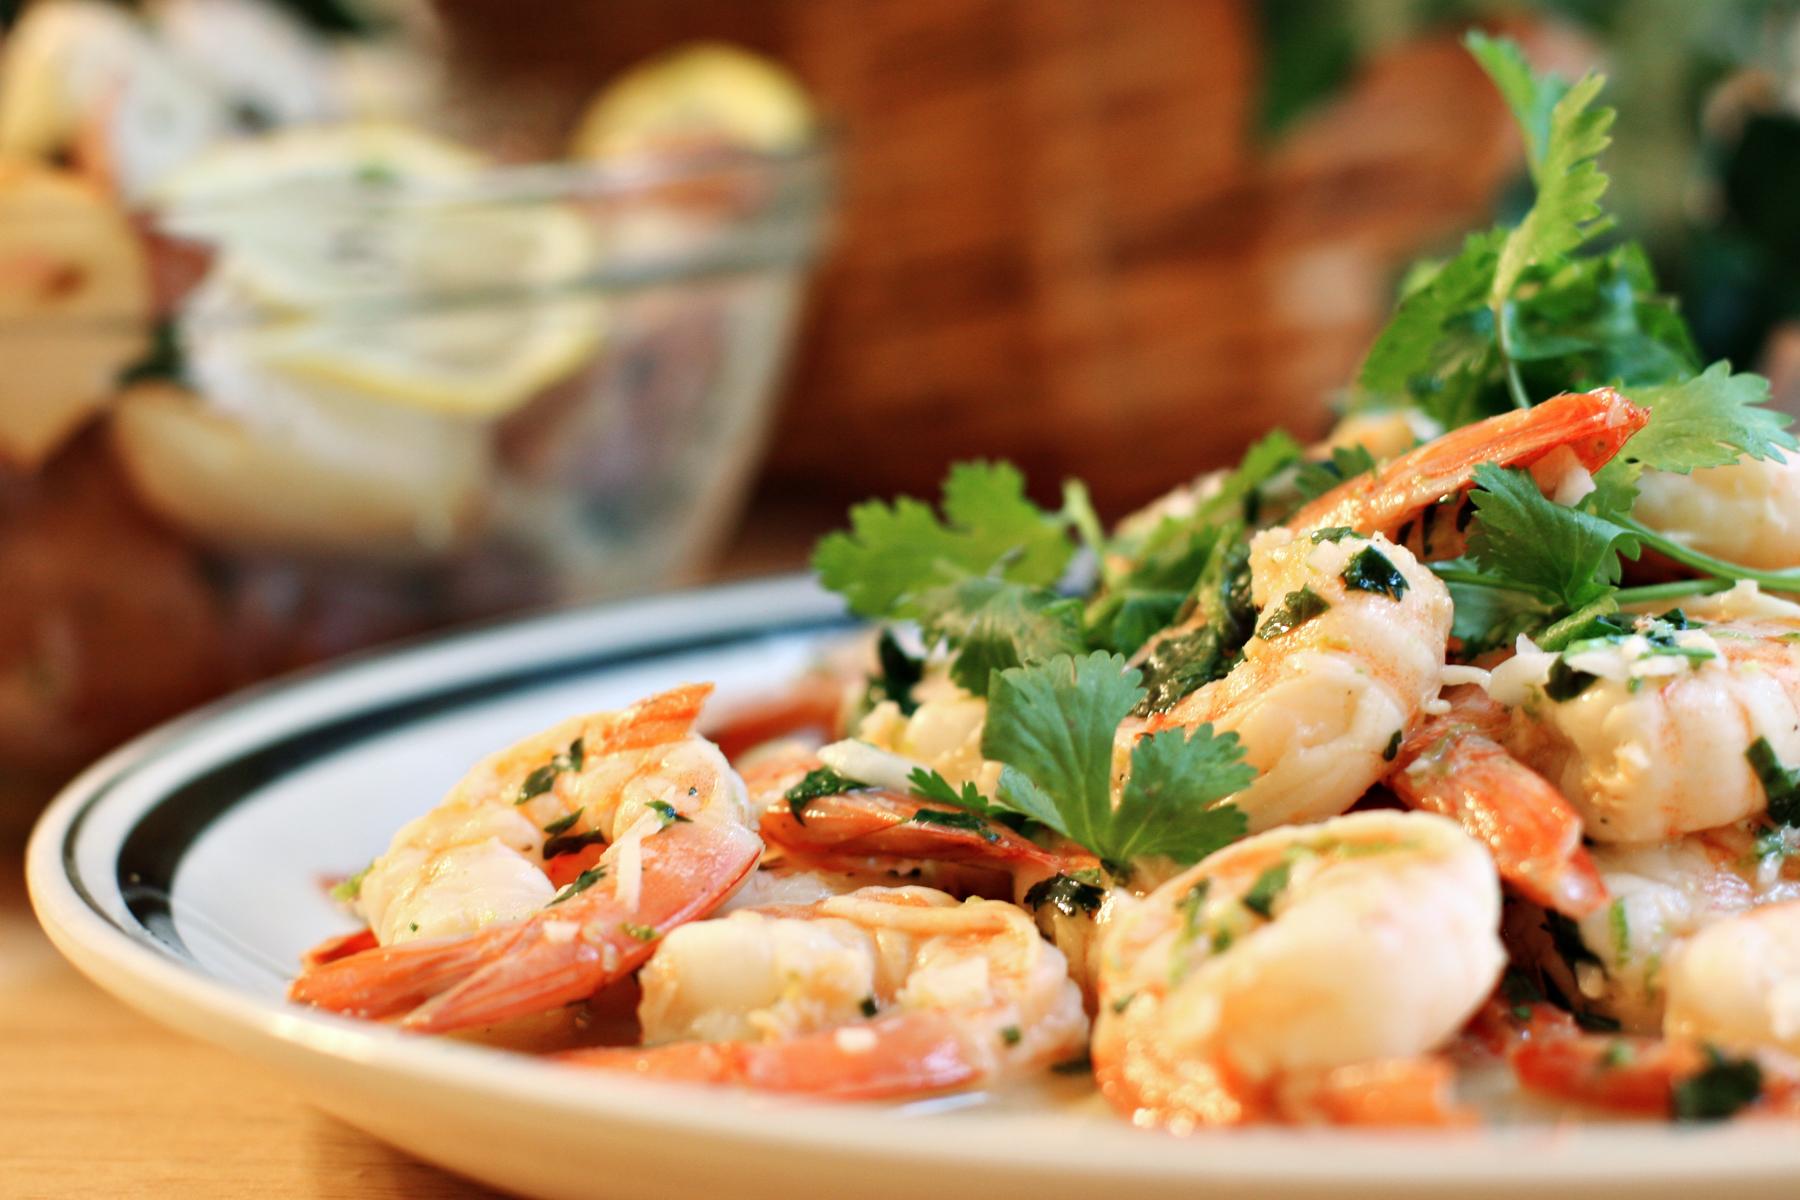 Ww Shrimp With Cilanto and Lime – 5 Pts.